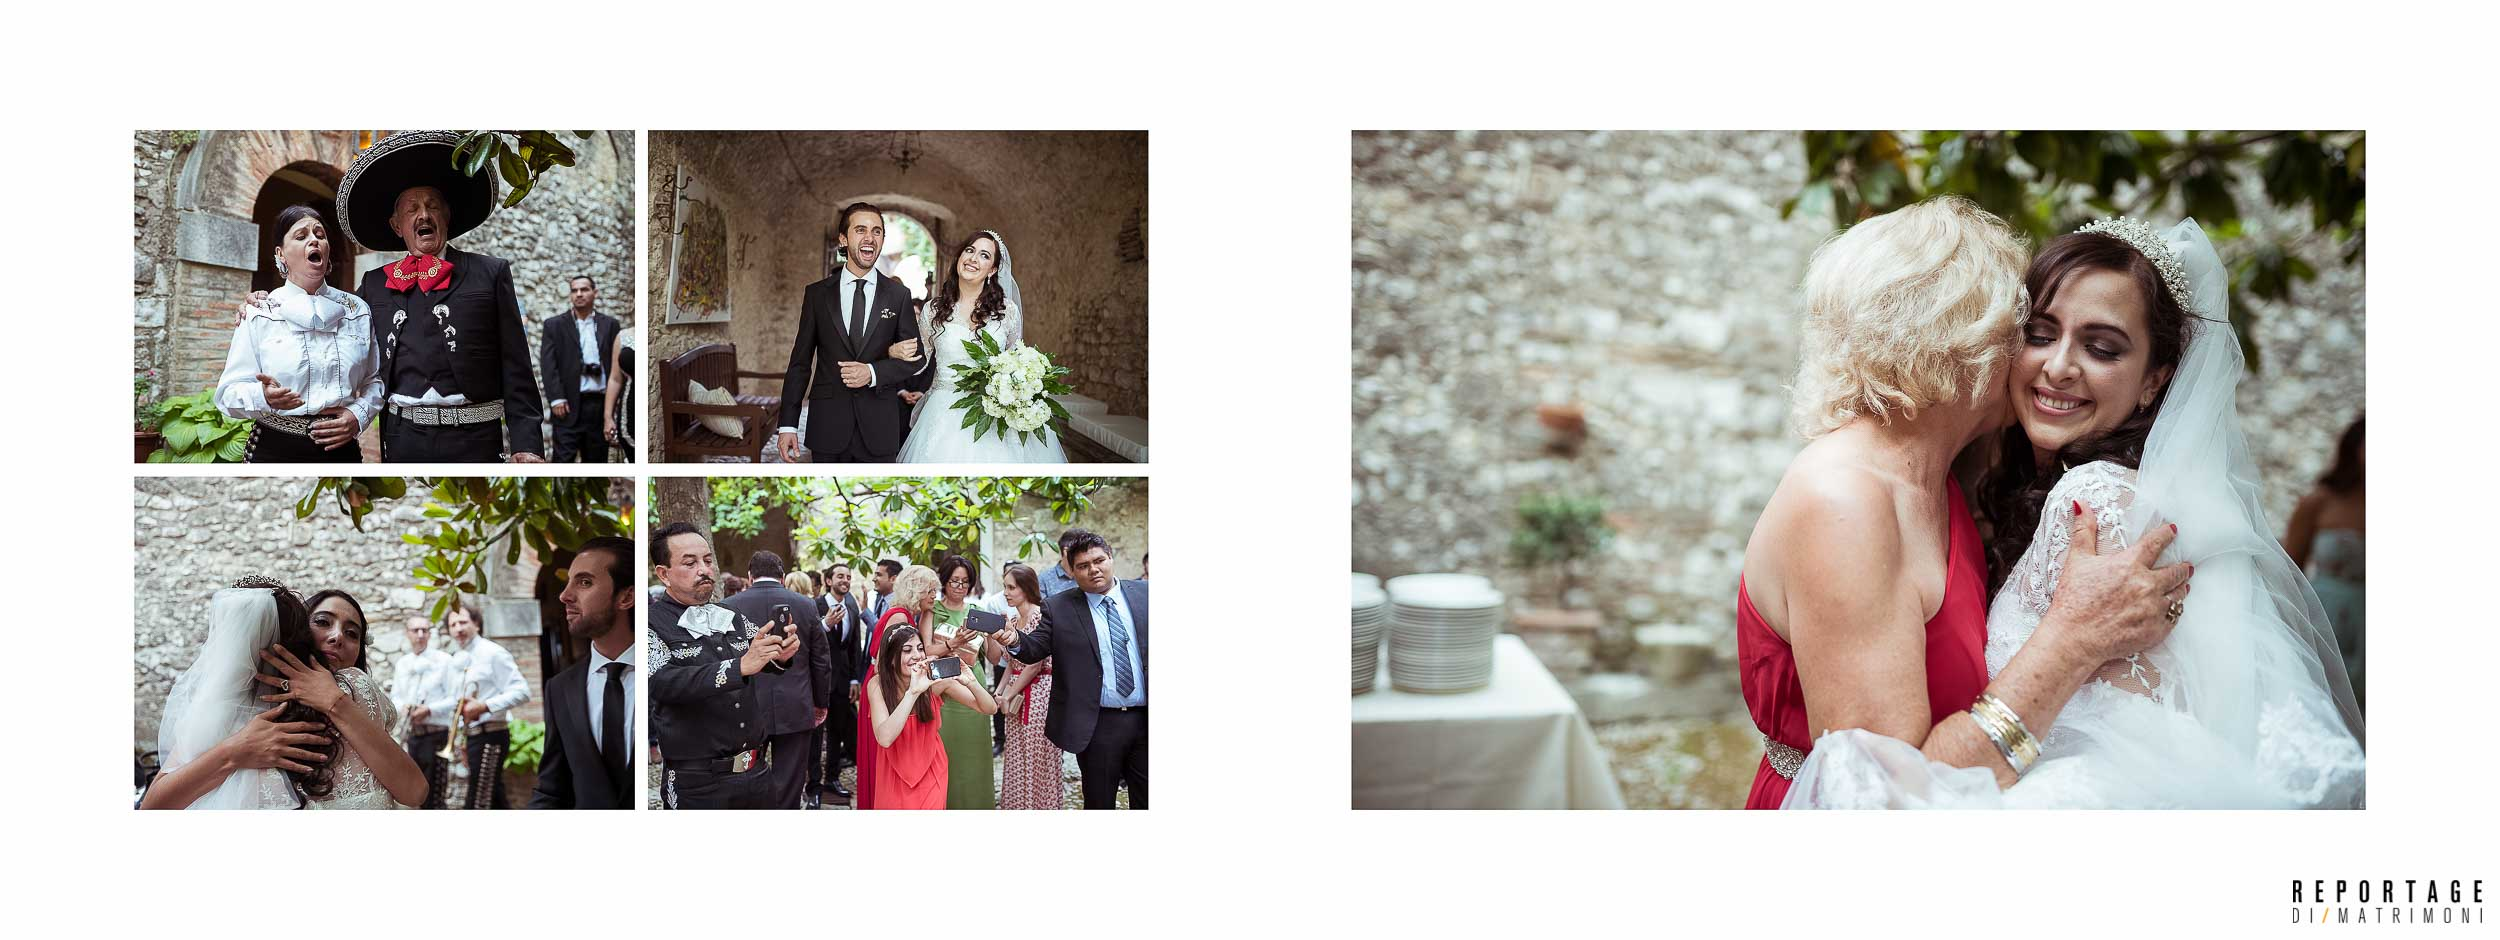 labro_wedding12